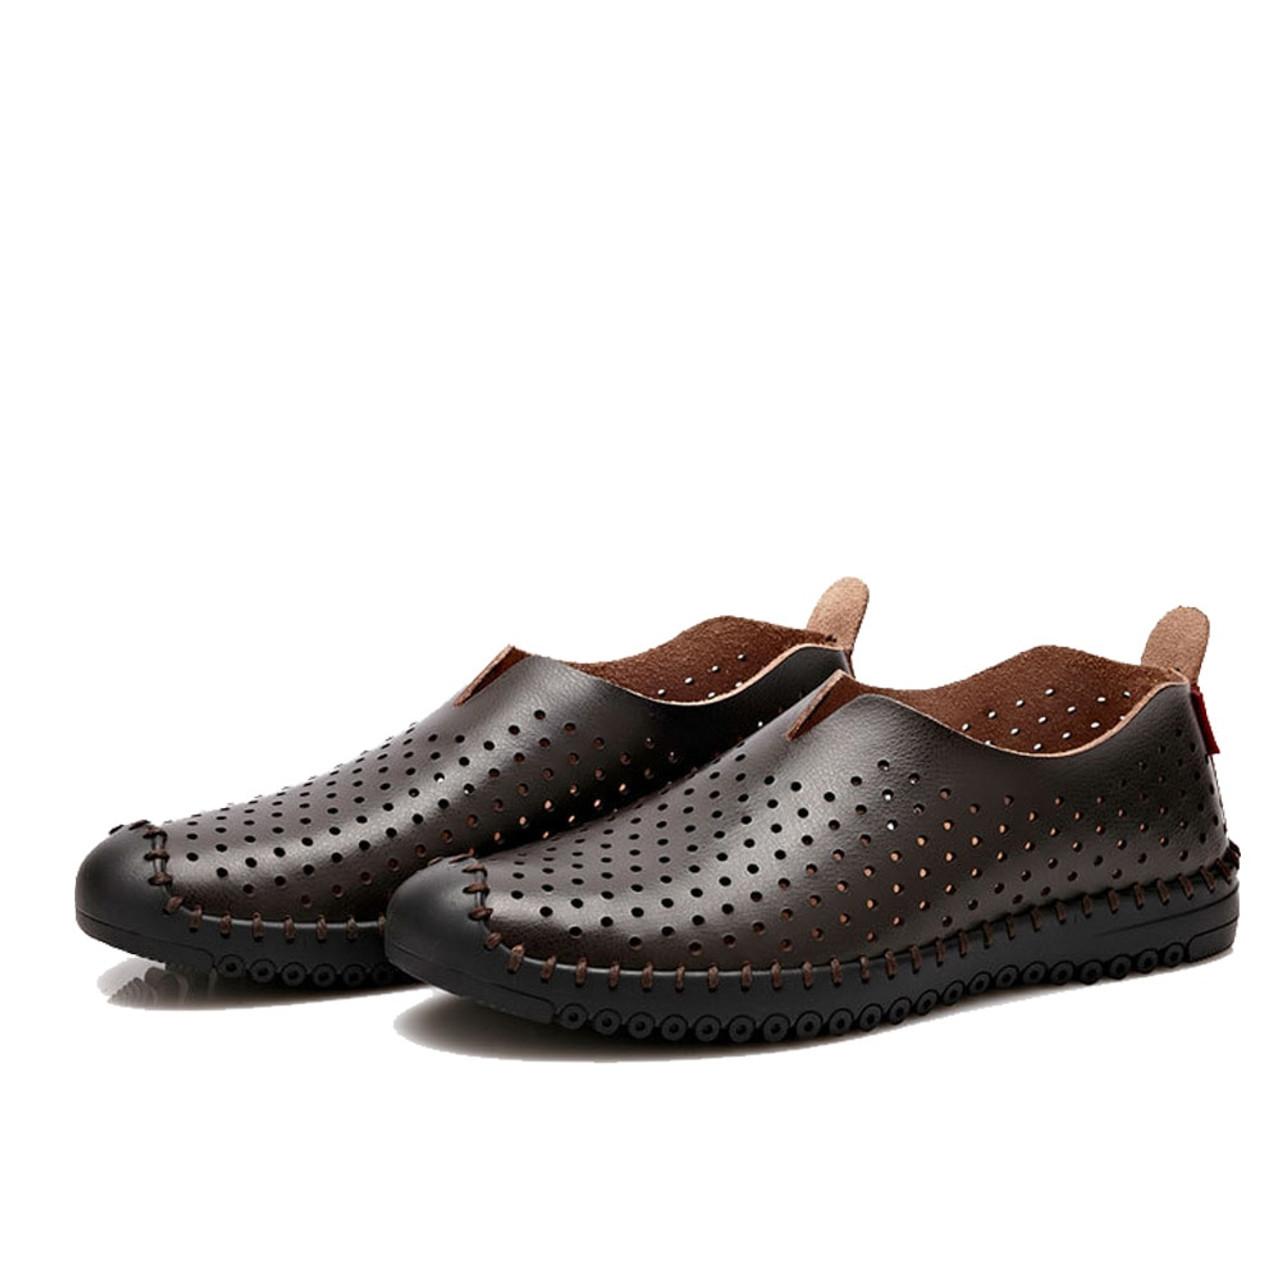 Npezkgc Men S Shoes New Fashion Genuine Leather Men S Loafers